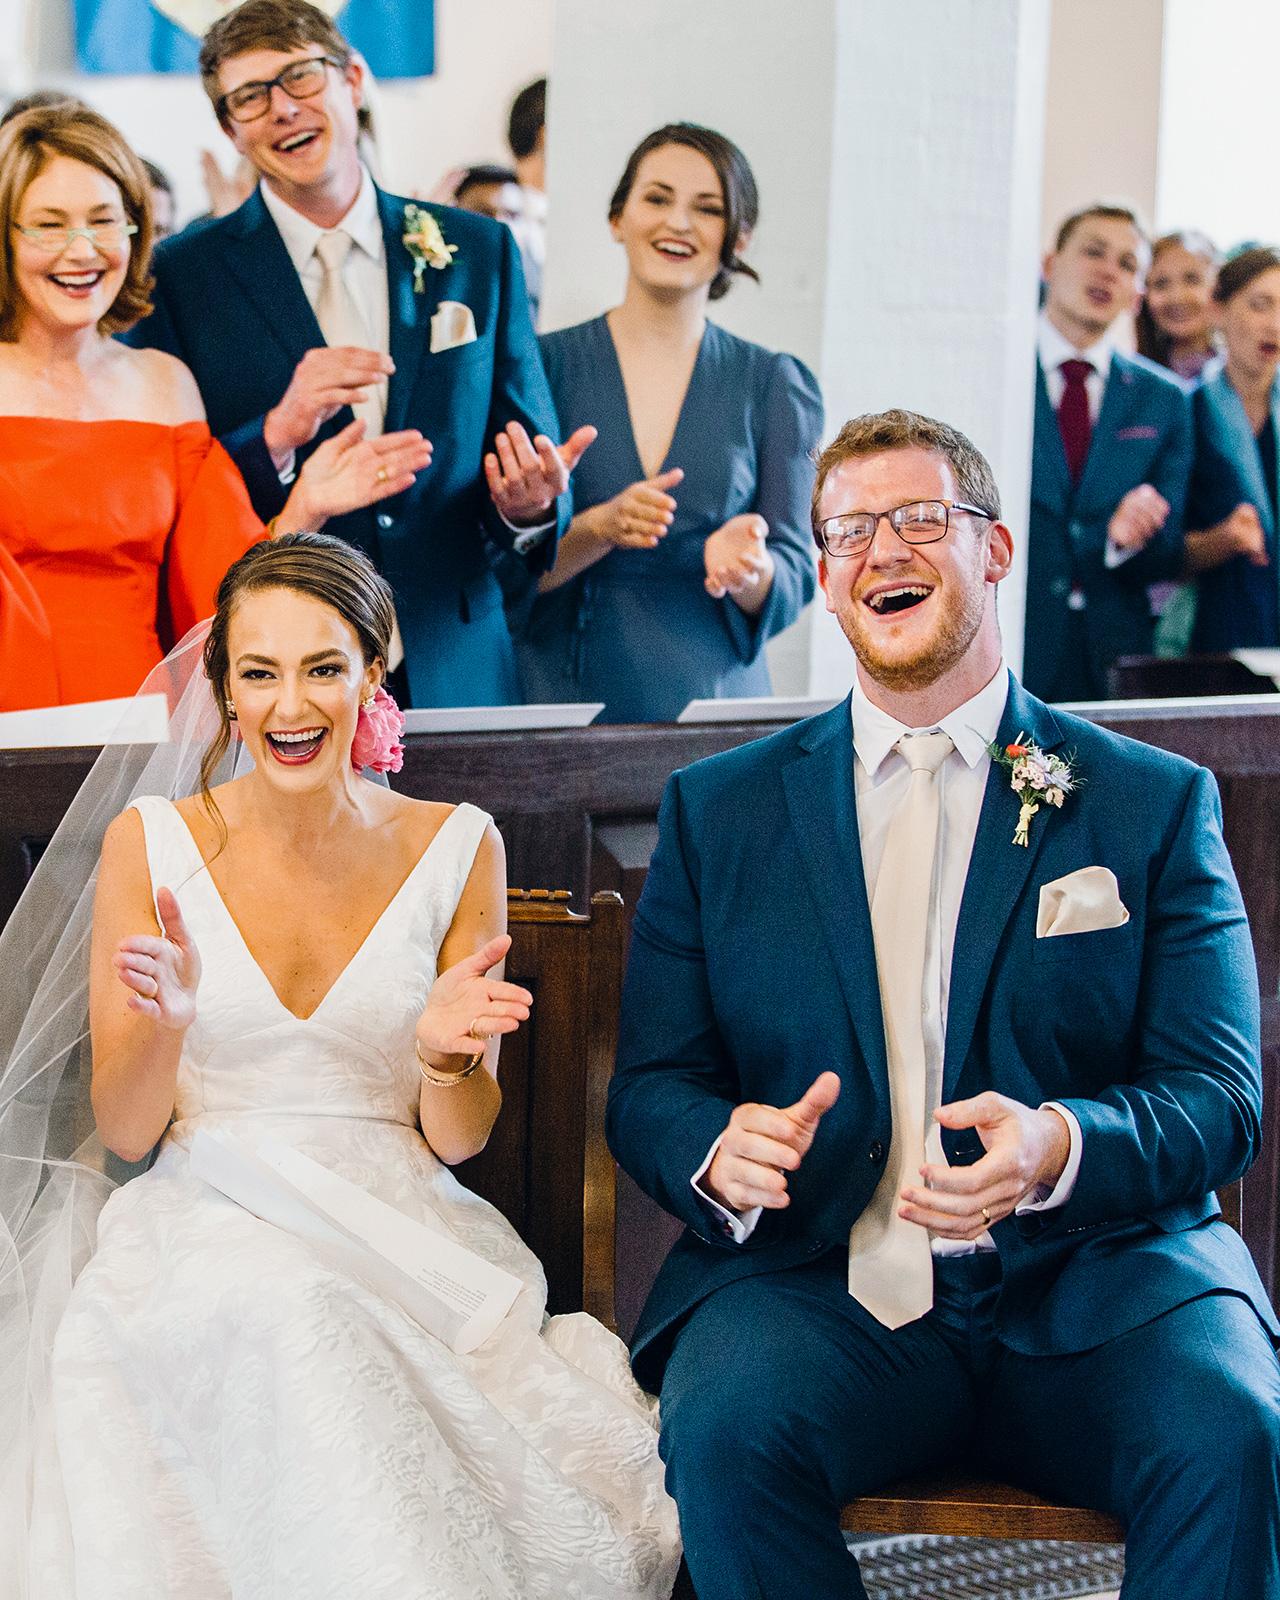 bride groom wedding reception singing clapping